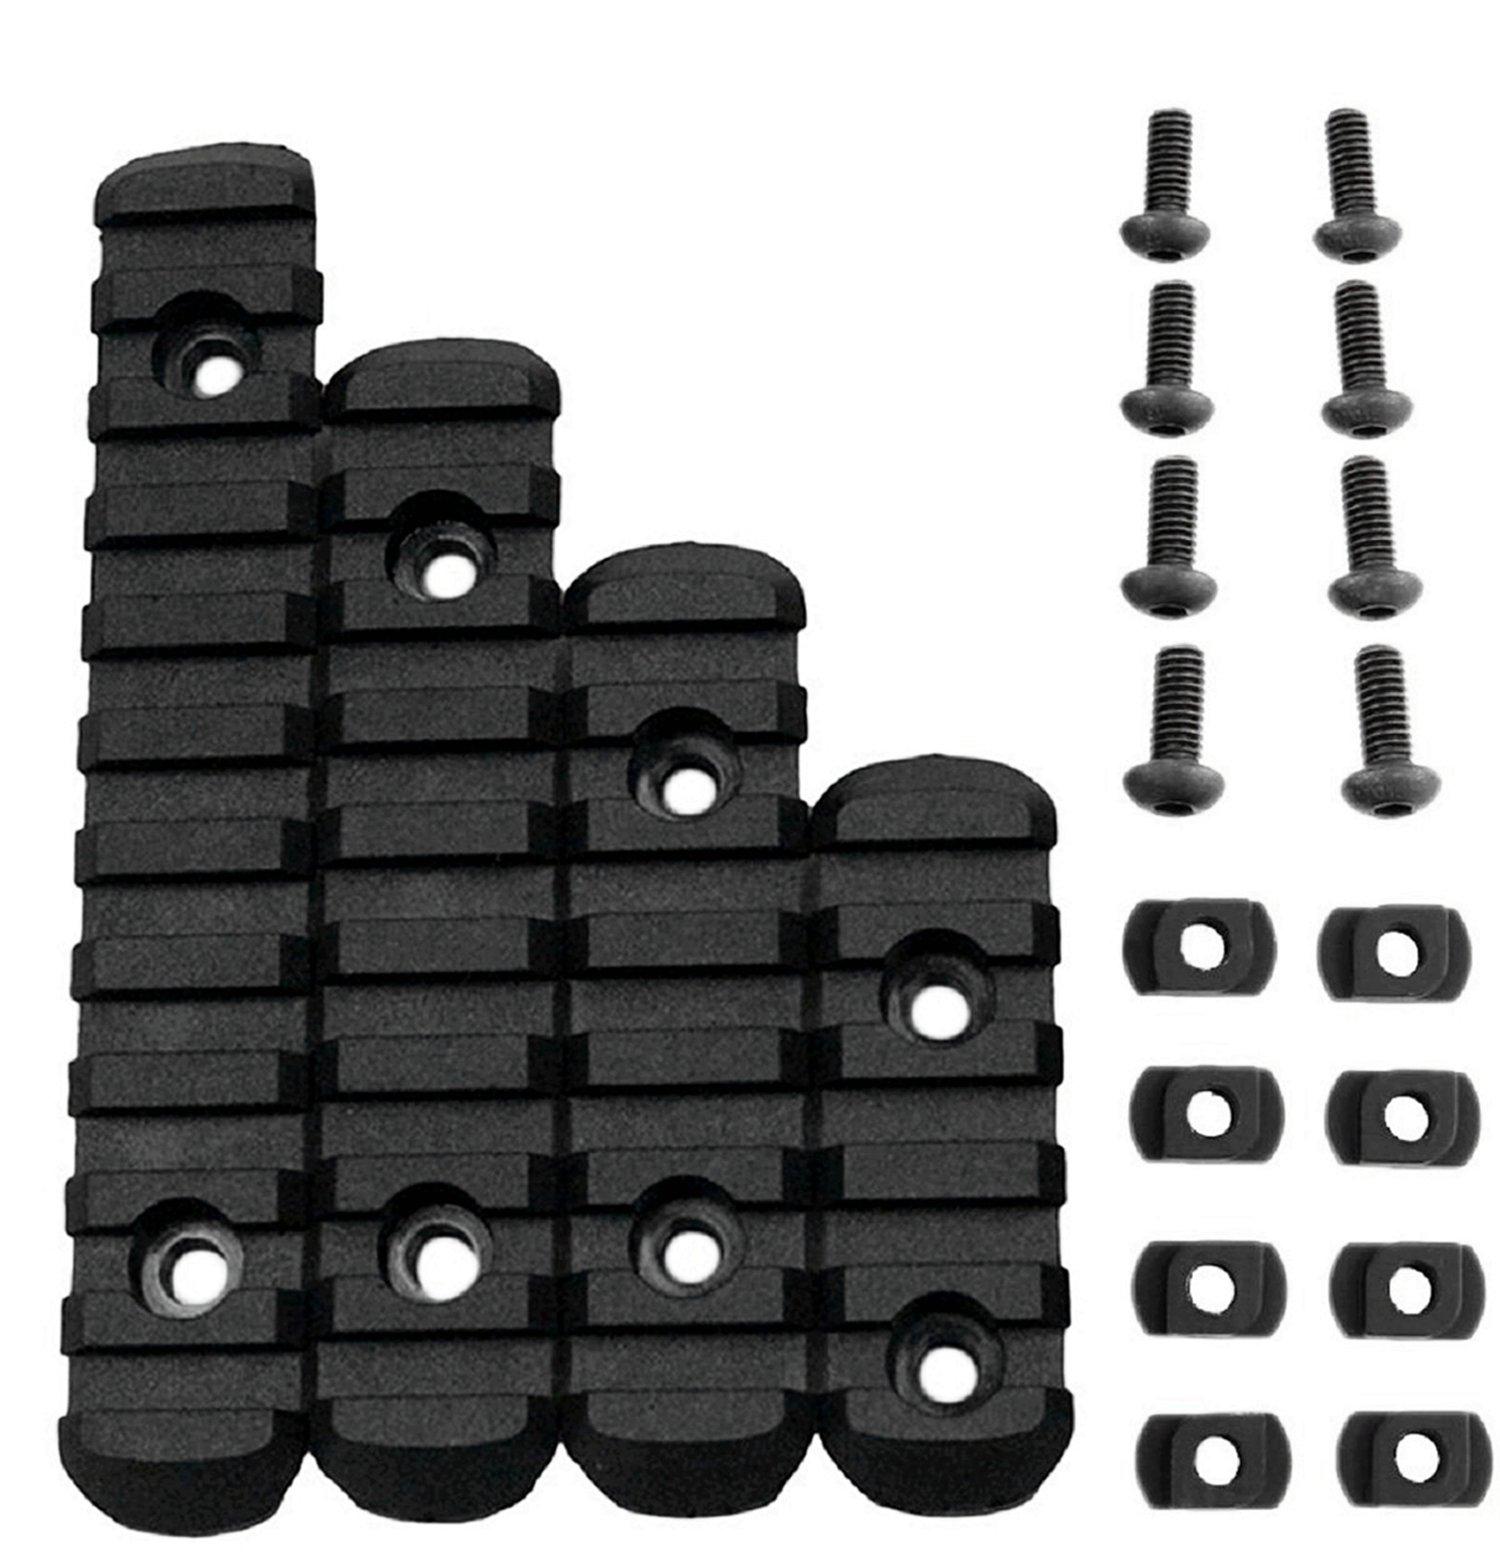 CRUSHUNT M-Lok Rail Section 5,7,9,11 Slot Polymer Picatinny/Weaver Rail Fits M-LOK Hand Guard